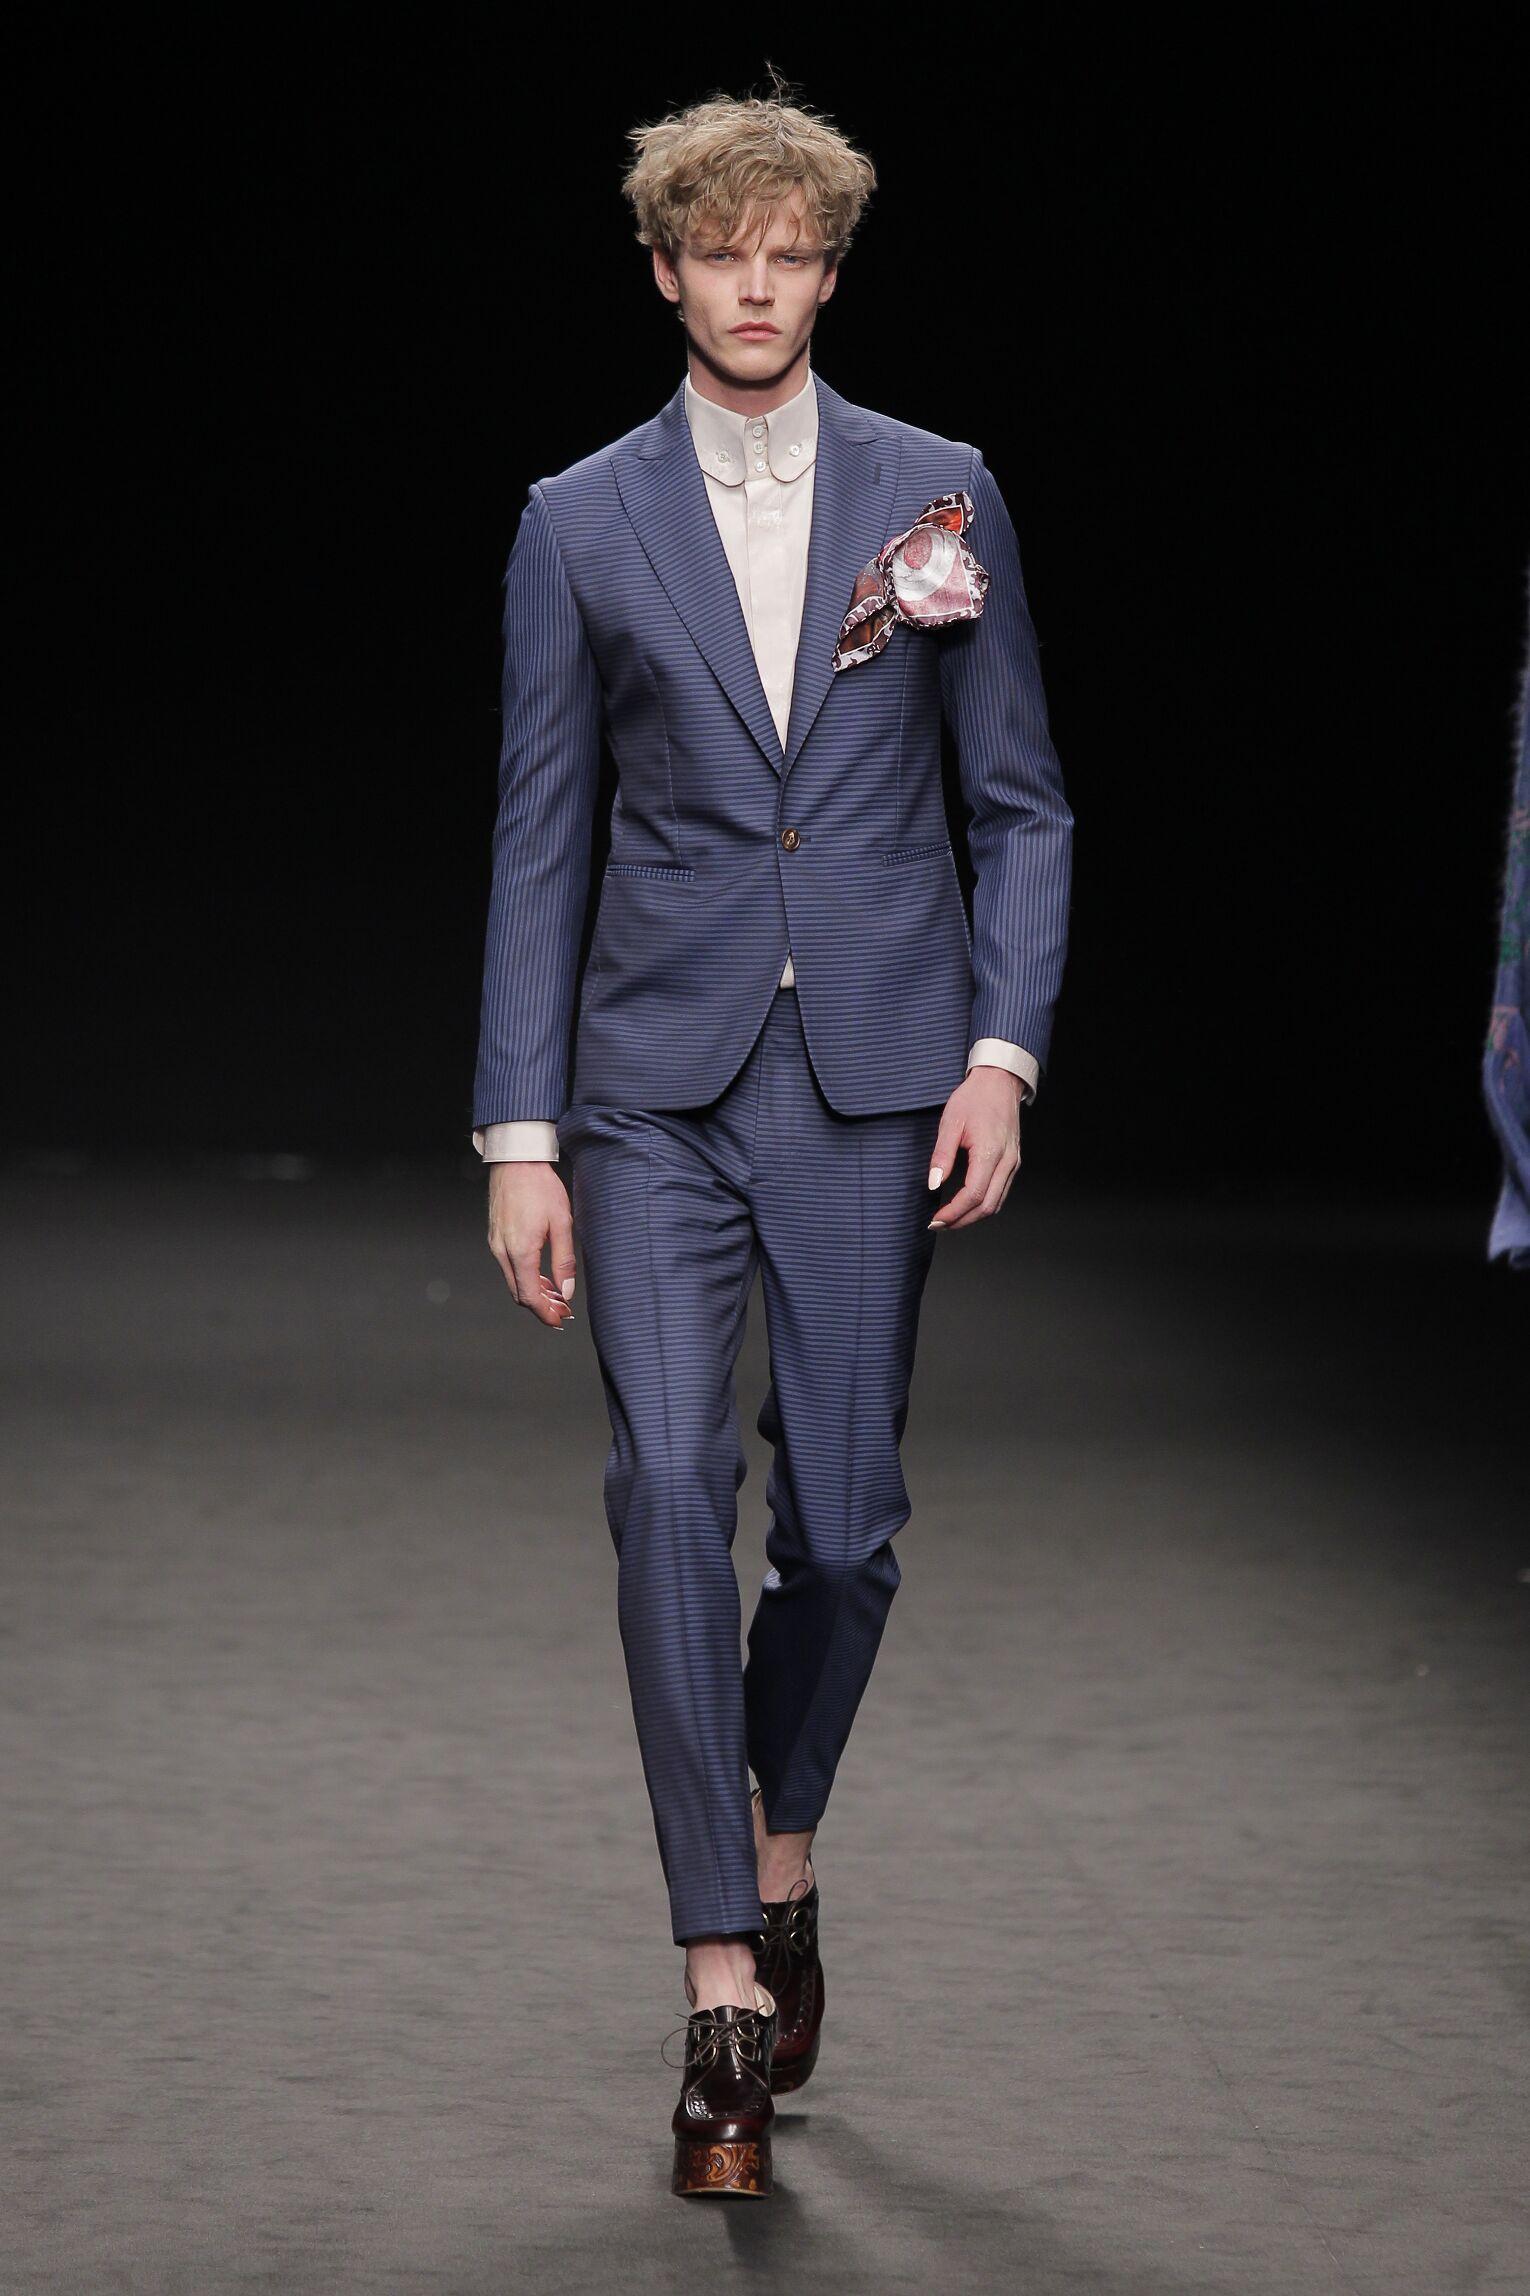 Runway Vivienne Westwood Fall Winter 2016 Men's Collection Milan Fashion Week